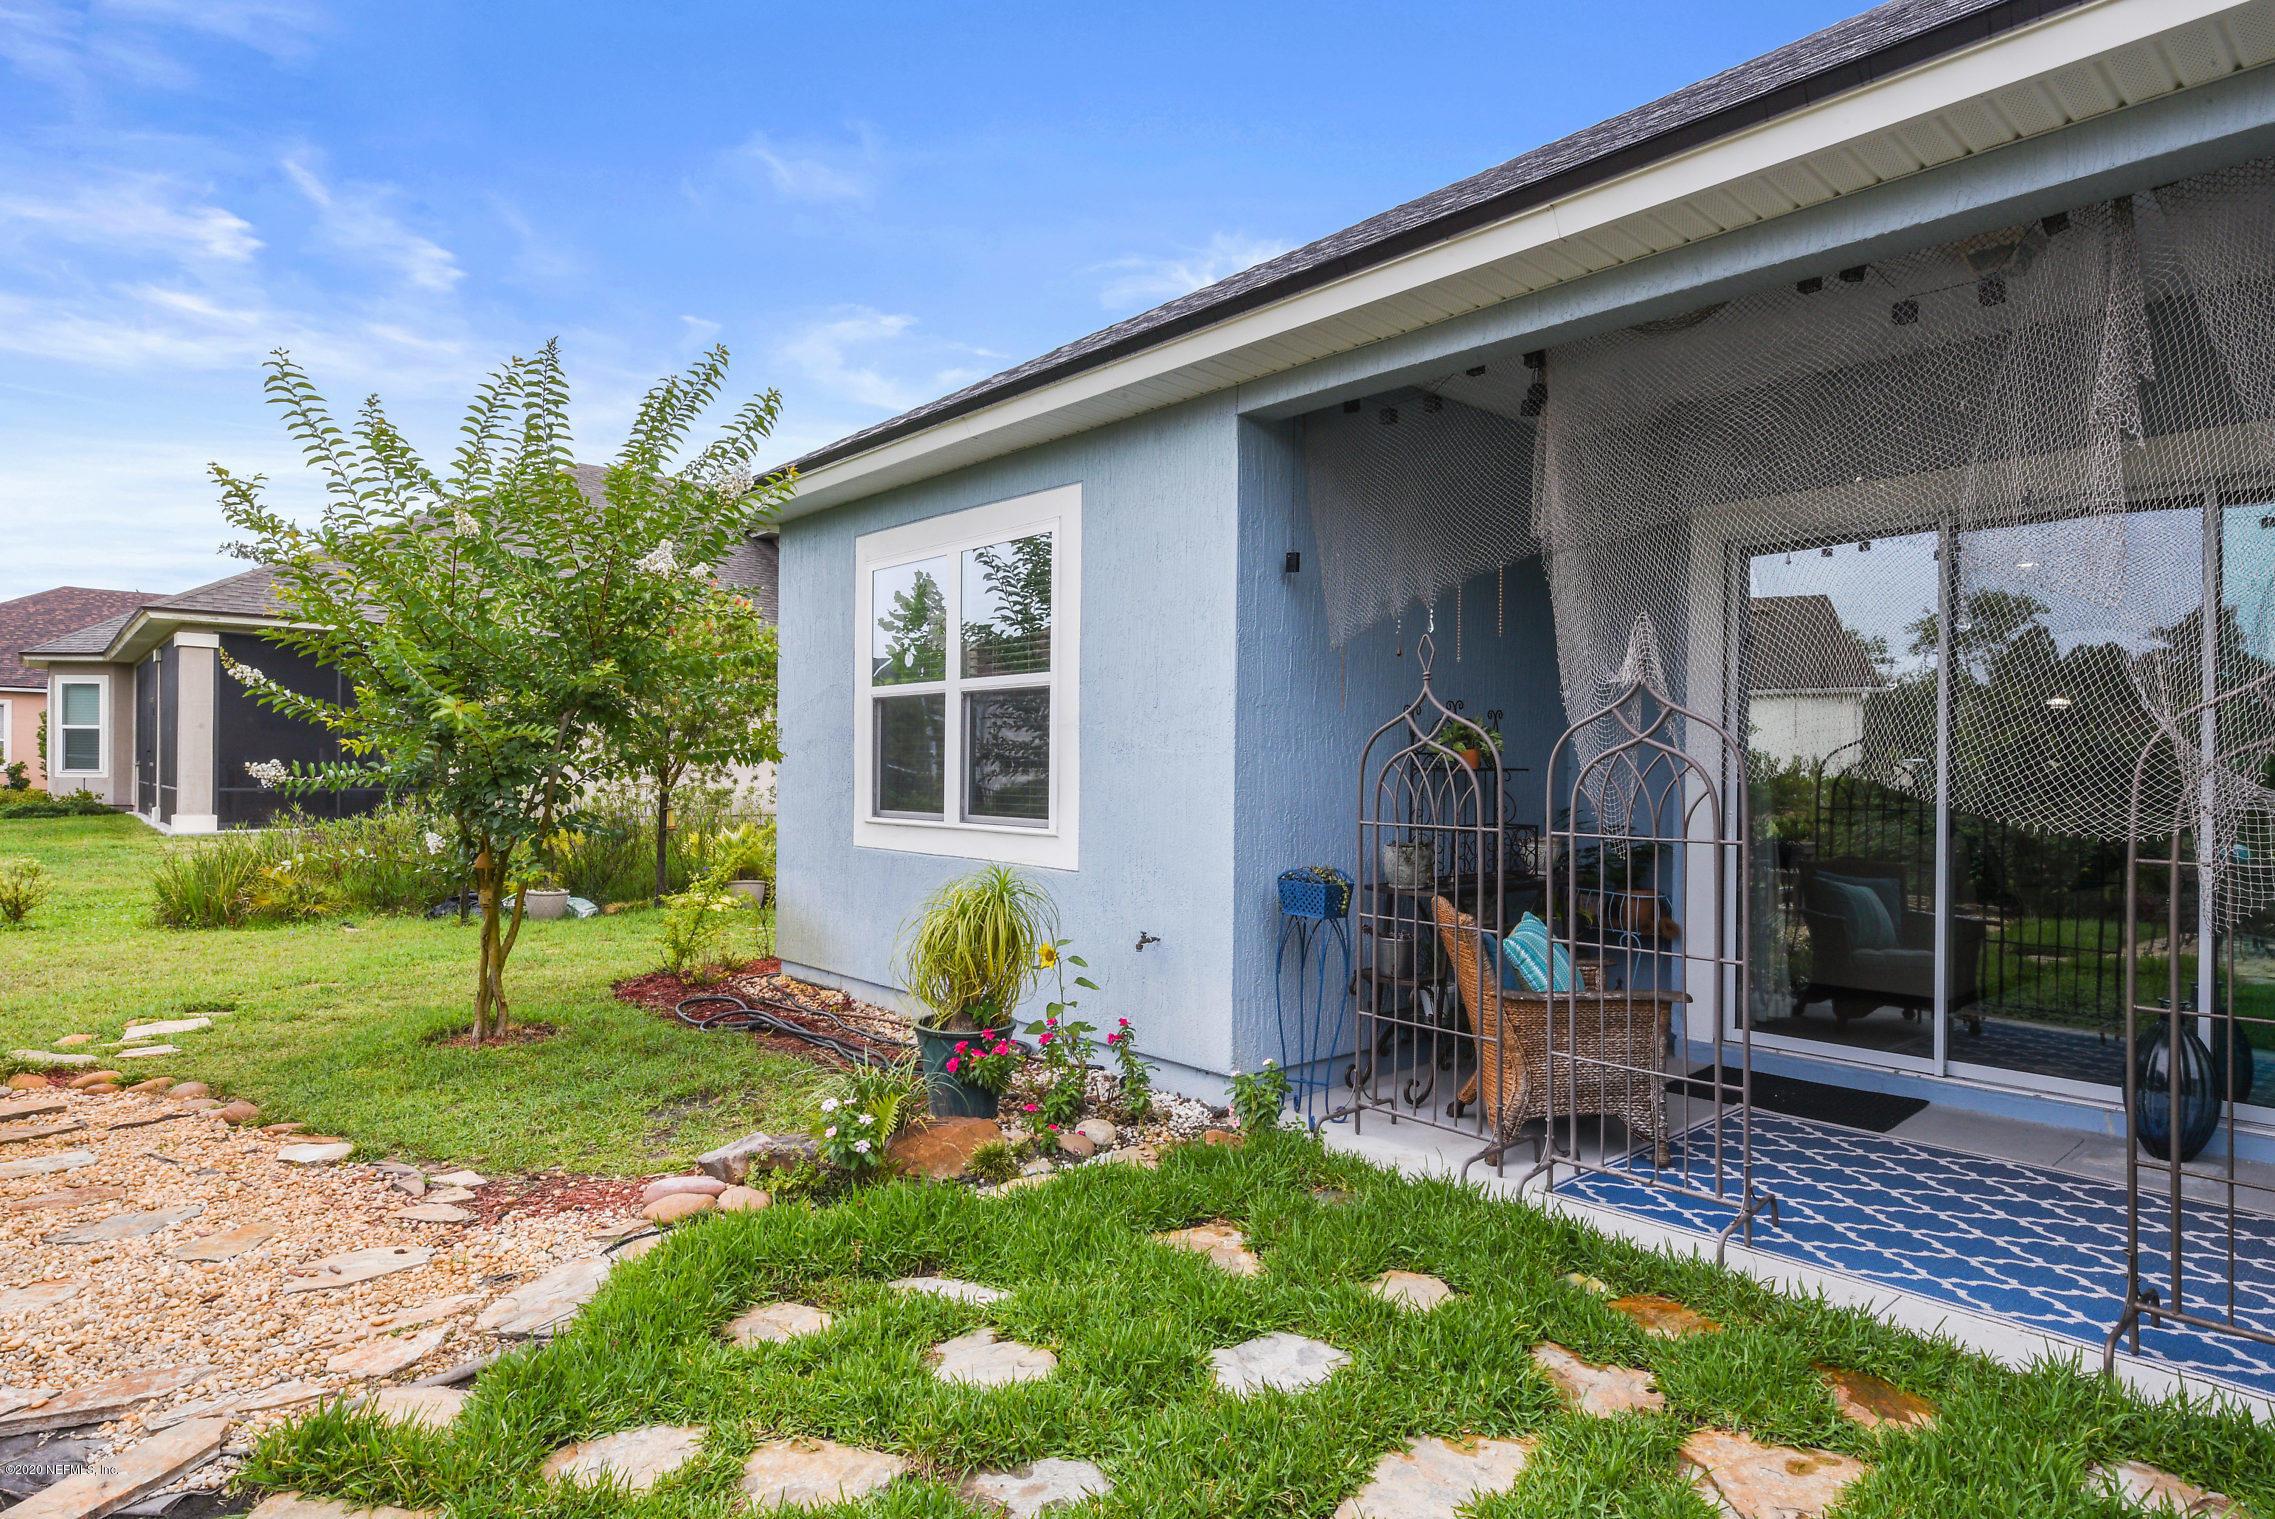 1335 POWIS, ST AUGUSTINE, FLORIDA 32095, 5 Bedrooms Bedrooms, ,3 BathroomsBathrooms,Residential,For sale,POWIS,1045874